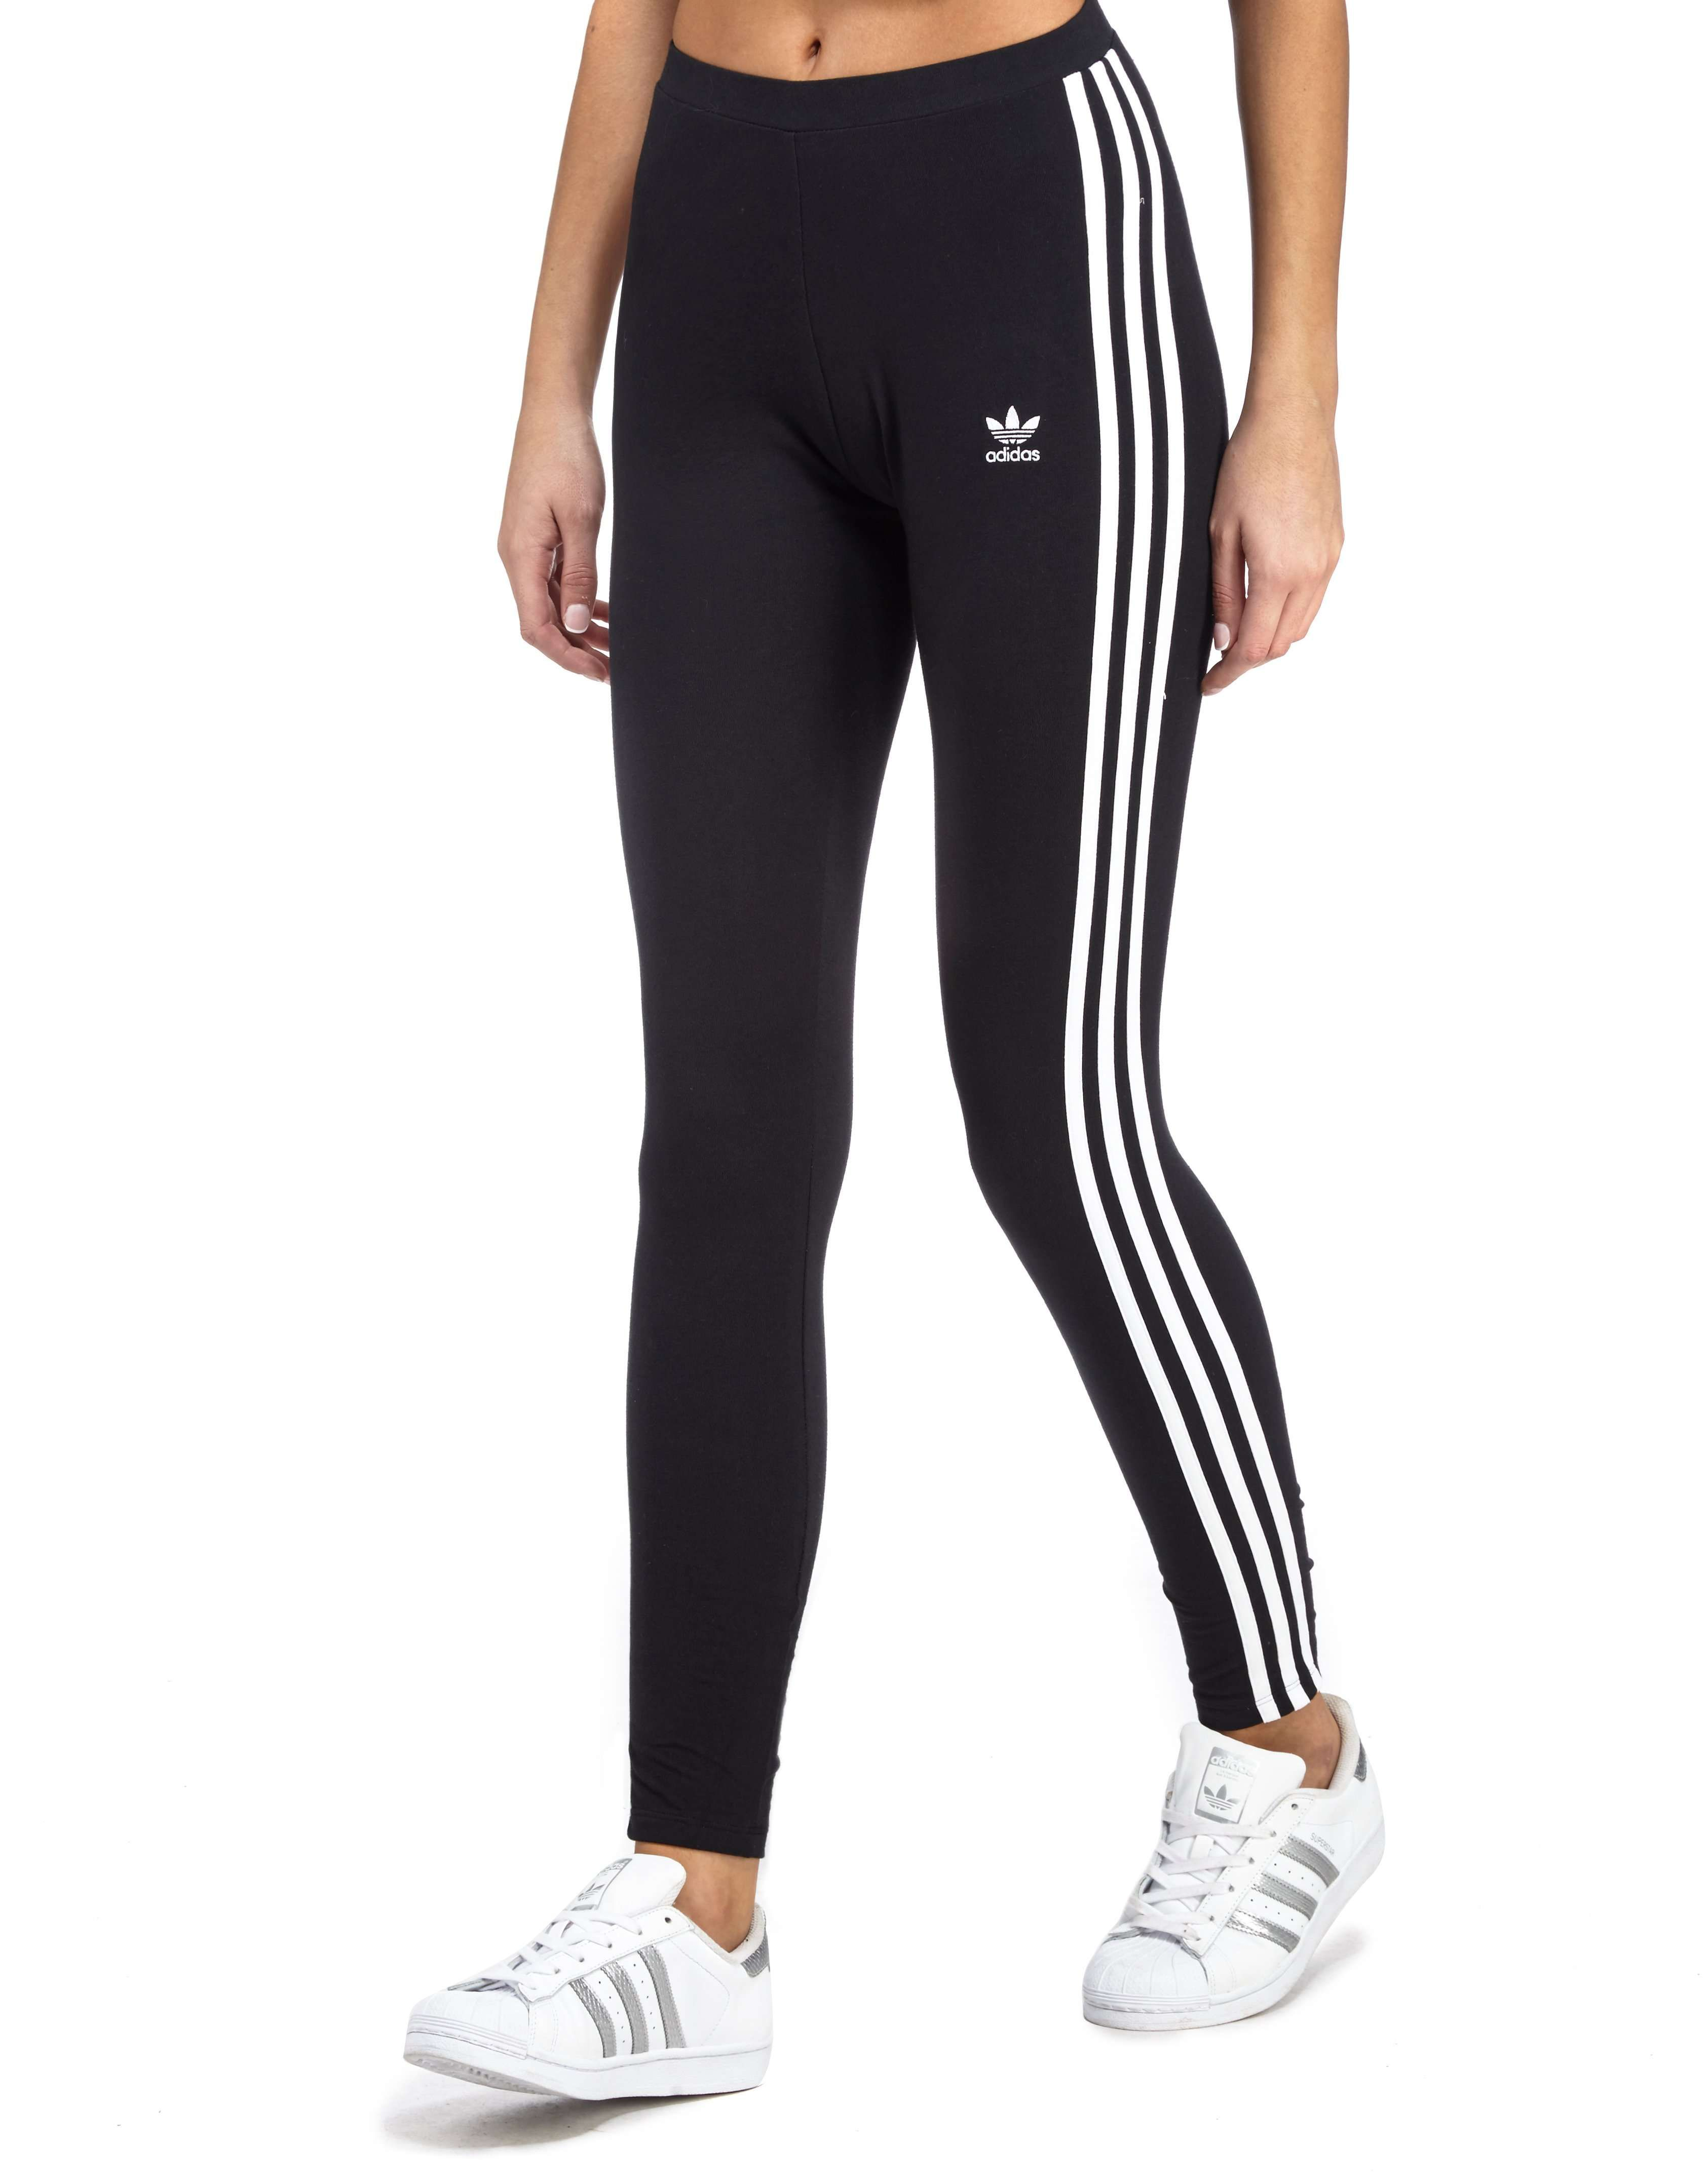 adidas Originals 3-Stripes Leggings - Shop online for adidas Originals  3-Stripes Leggings